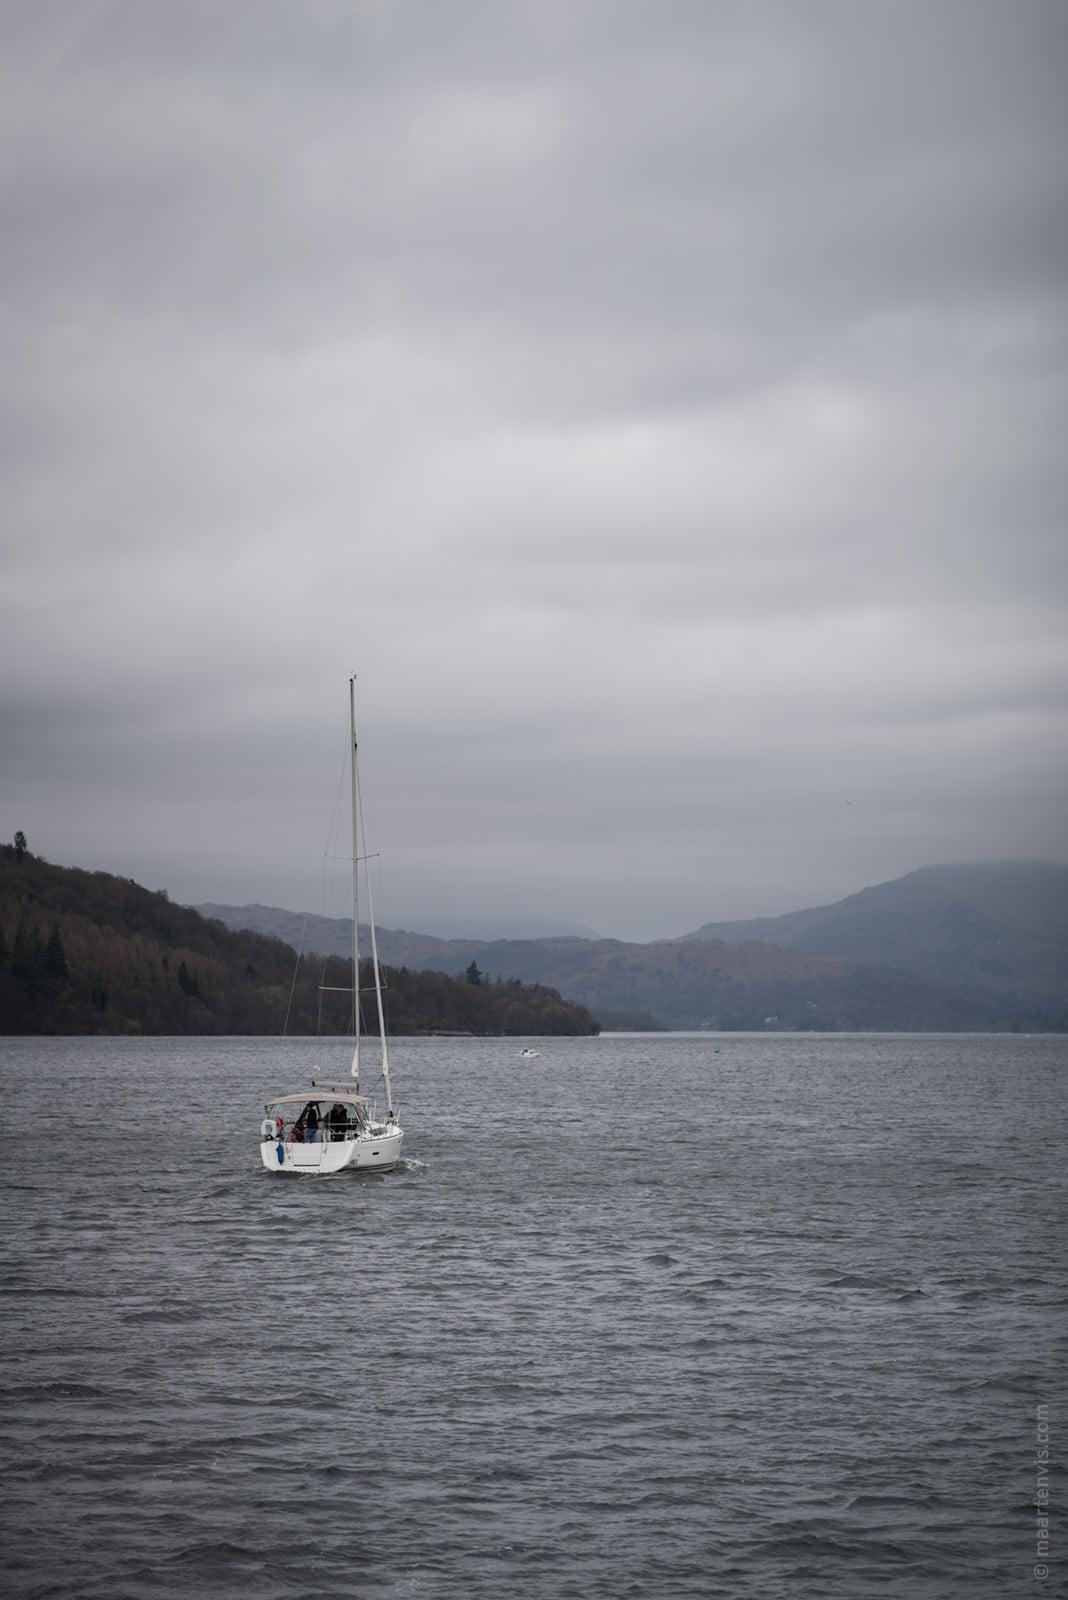 20160326 8361 - Lake District Impressions